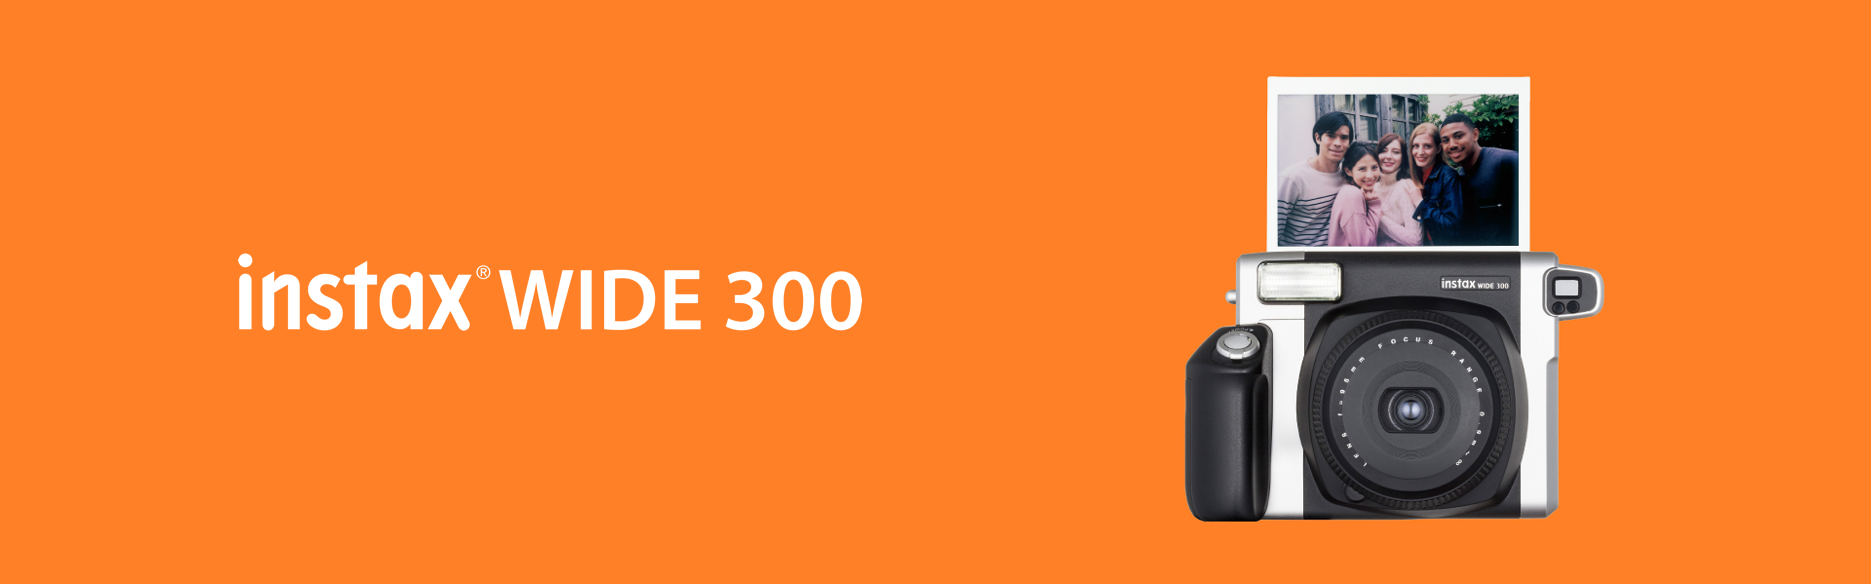 Orange hero image with WIDE 300 camera